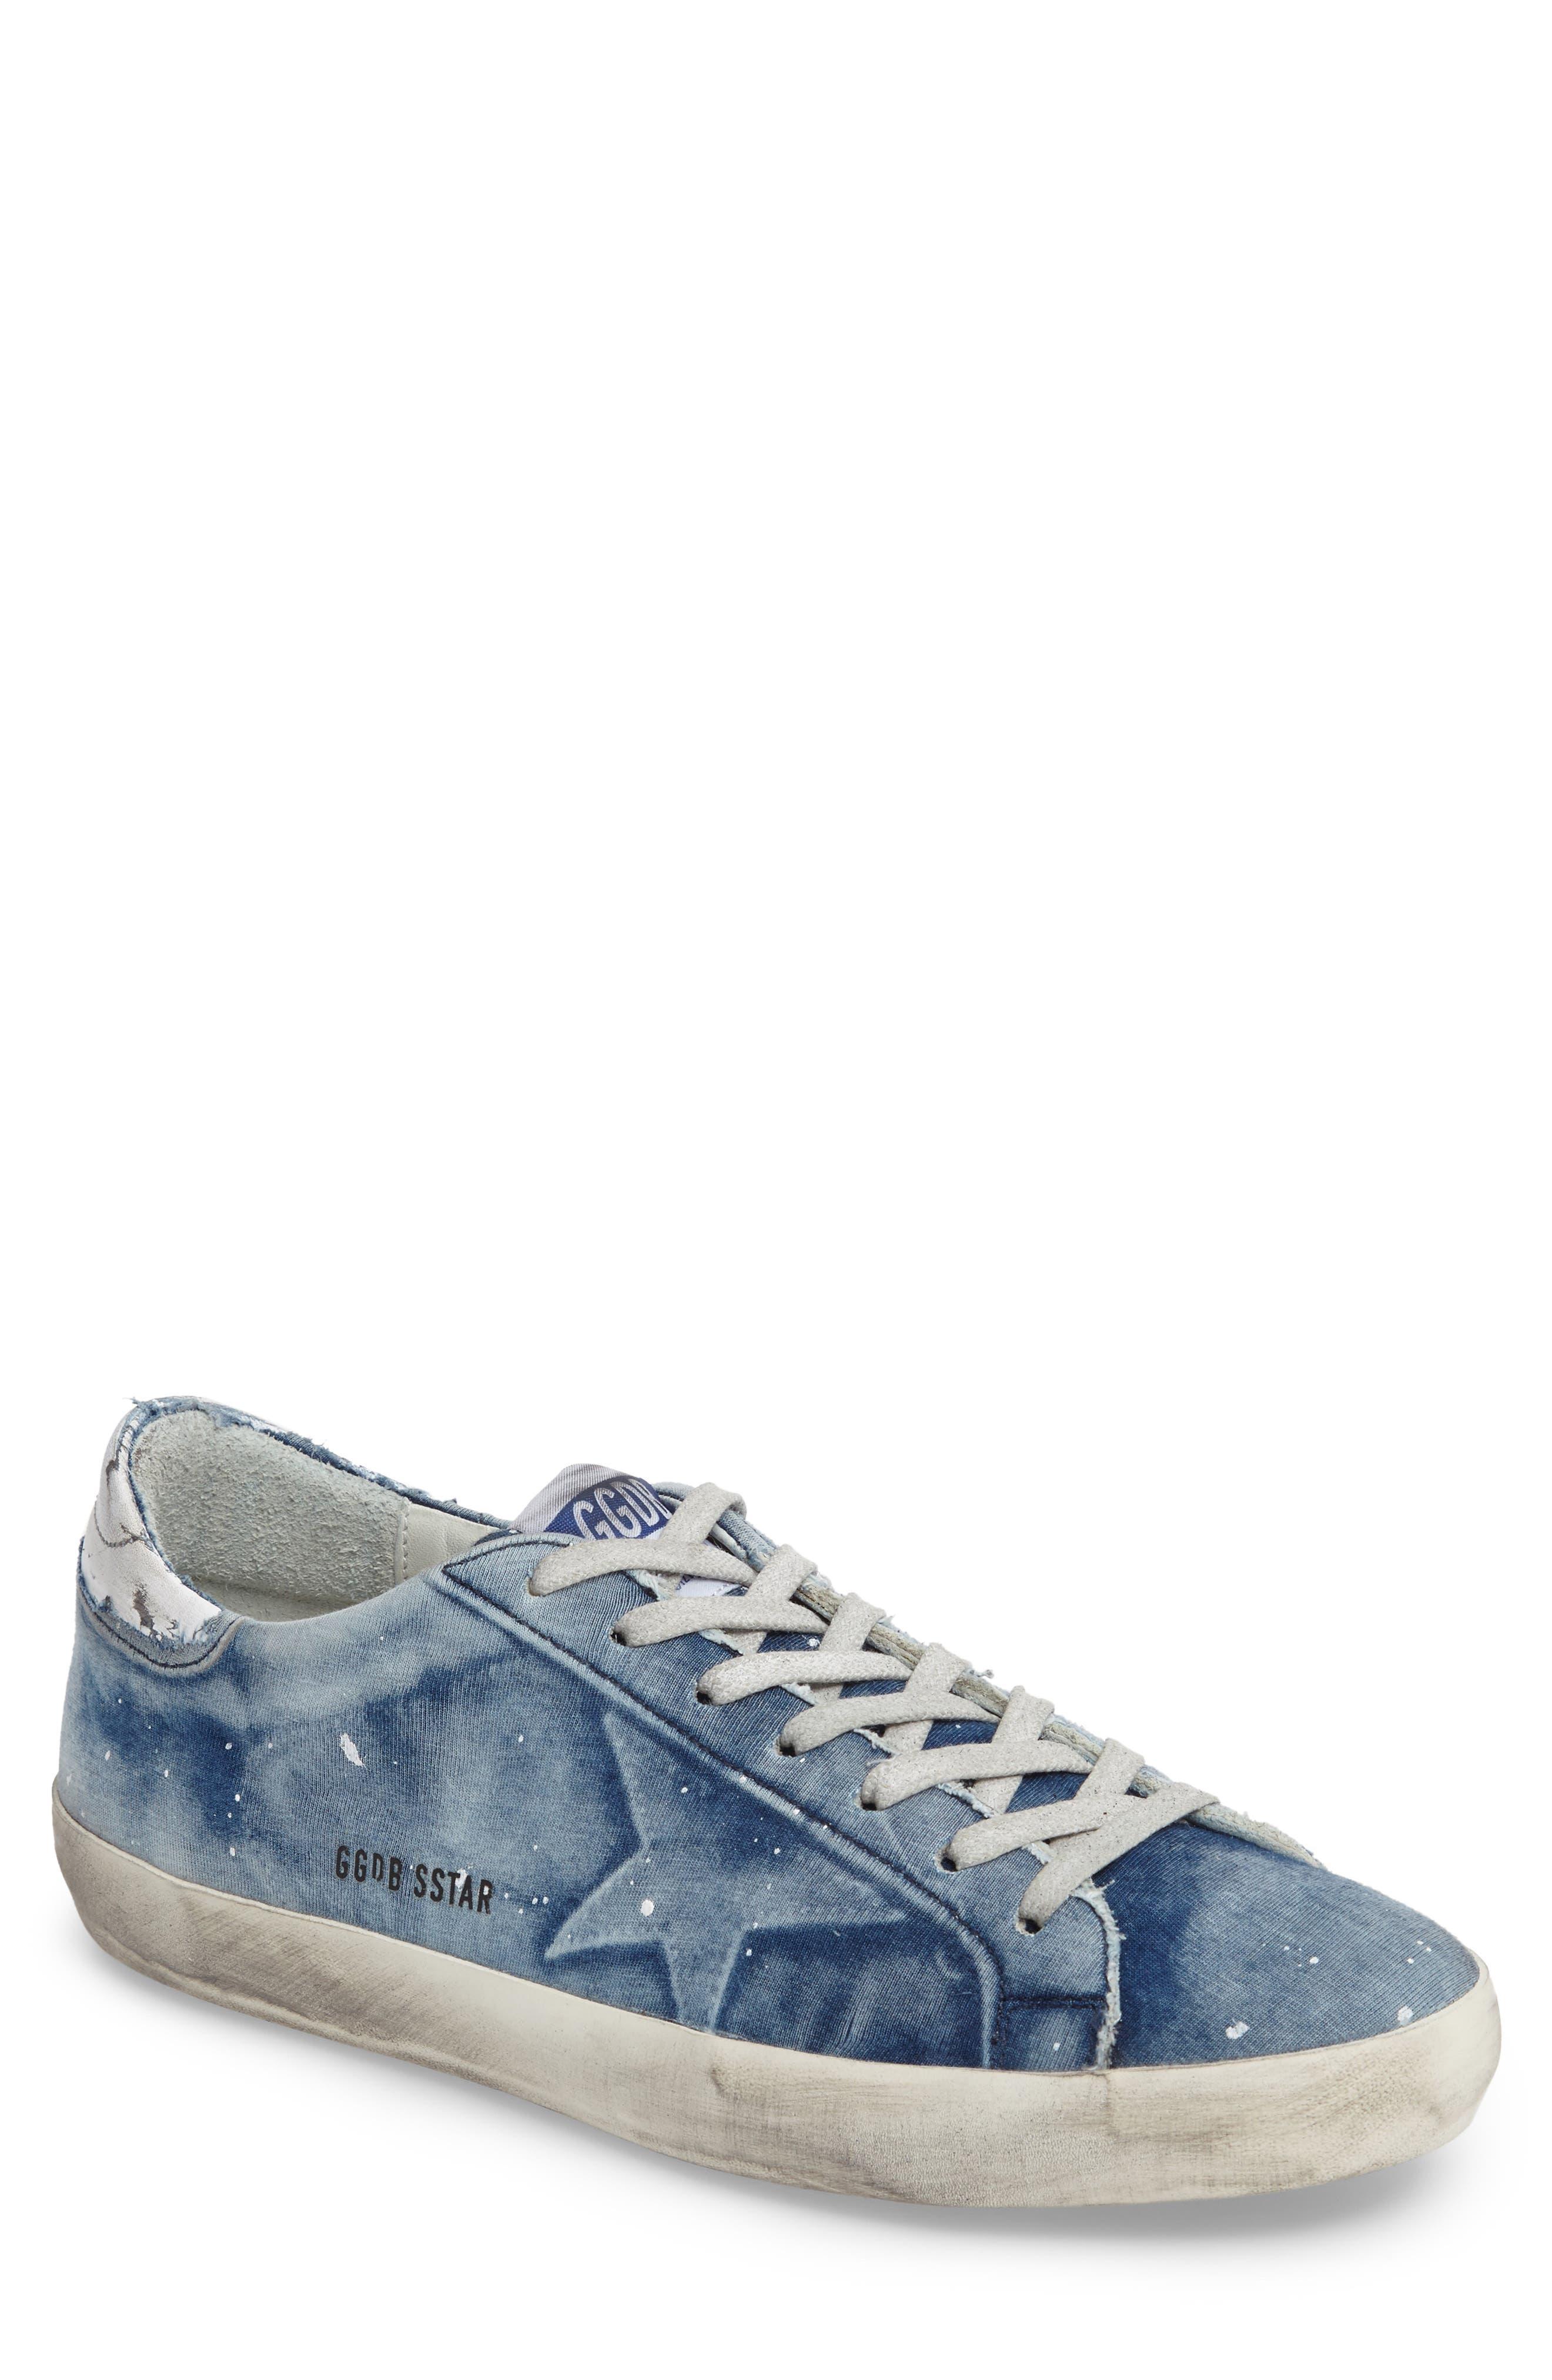 ,                             'Superstar' Sneaker,                             Main thumbnail 121, color,                             402